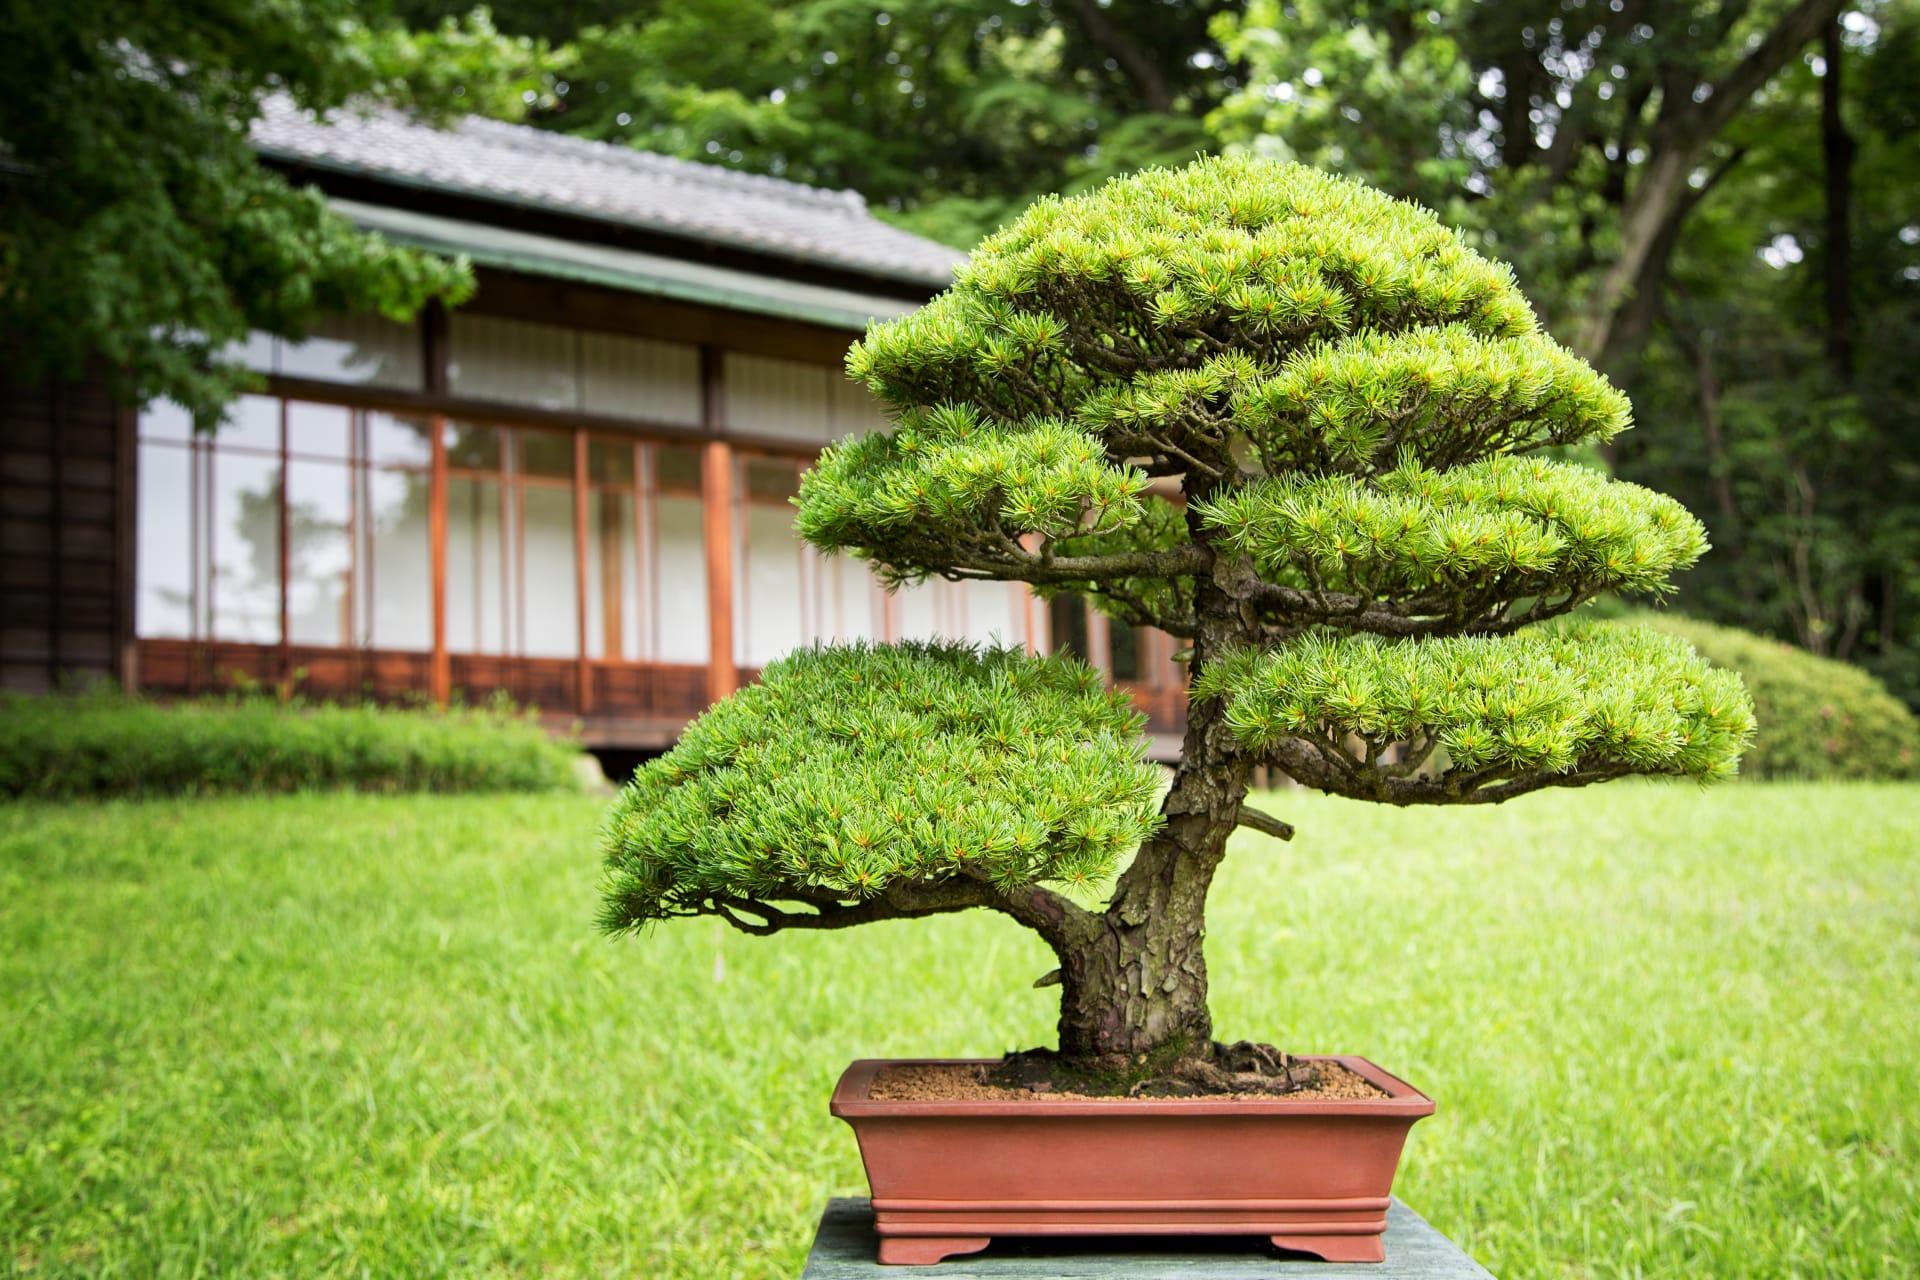 Tokyo - The Living Art of Bonsai Trees